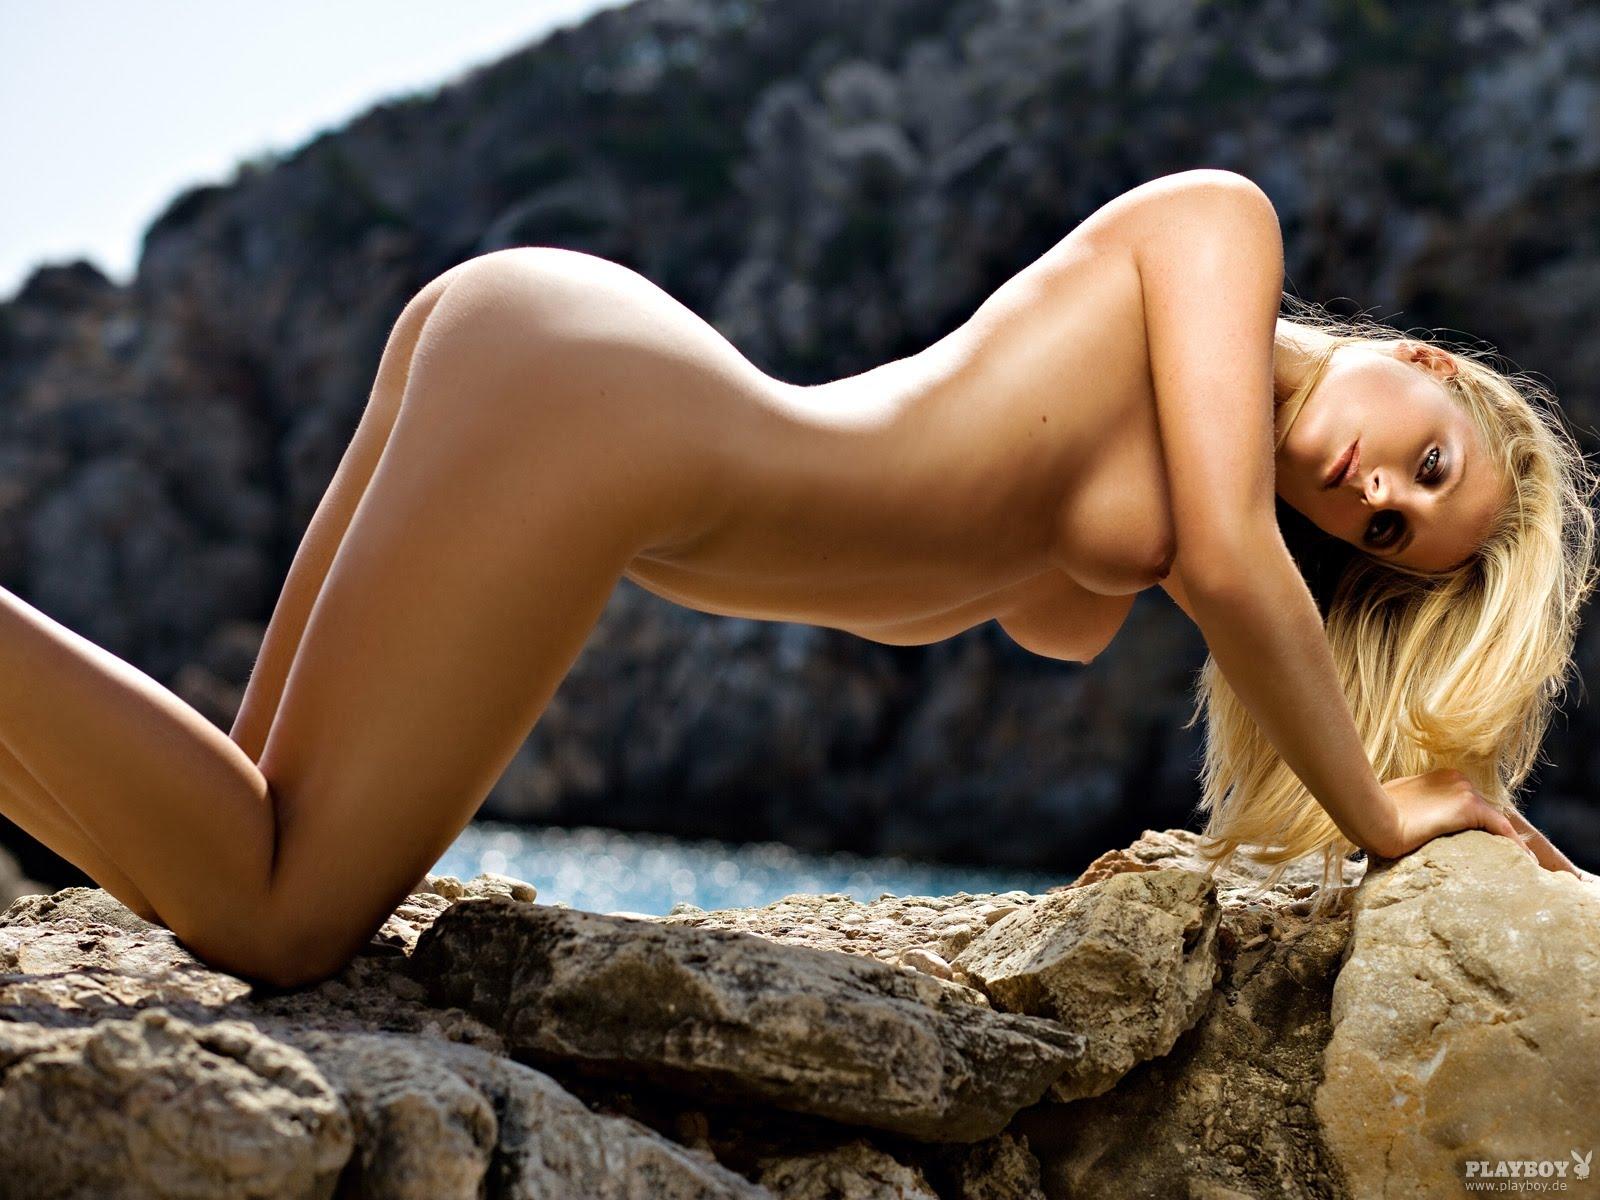 I_am_iris nude